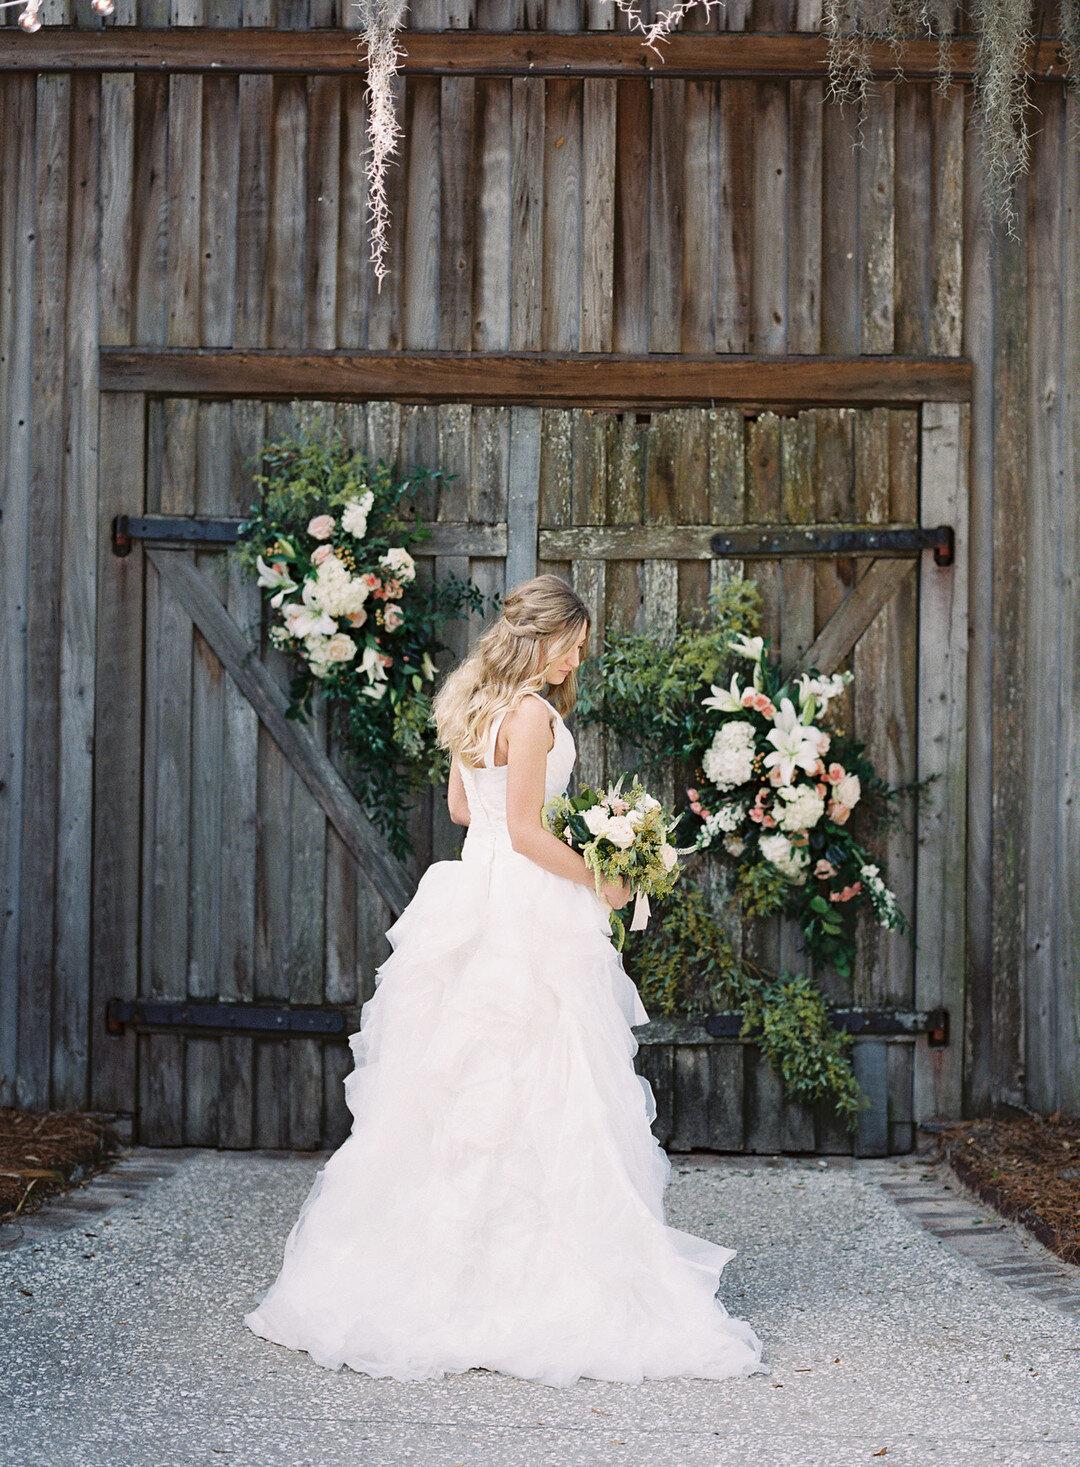 Citrus Themed Wedding Inspiration At Boone Hall Plantation A Lowcountry Wedding Blog Magazine Charleston Savannah Hilton Head Myrtle Beach